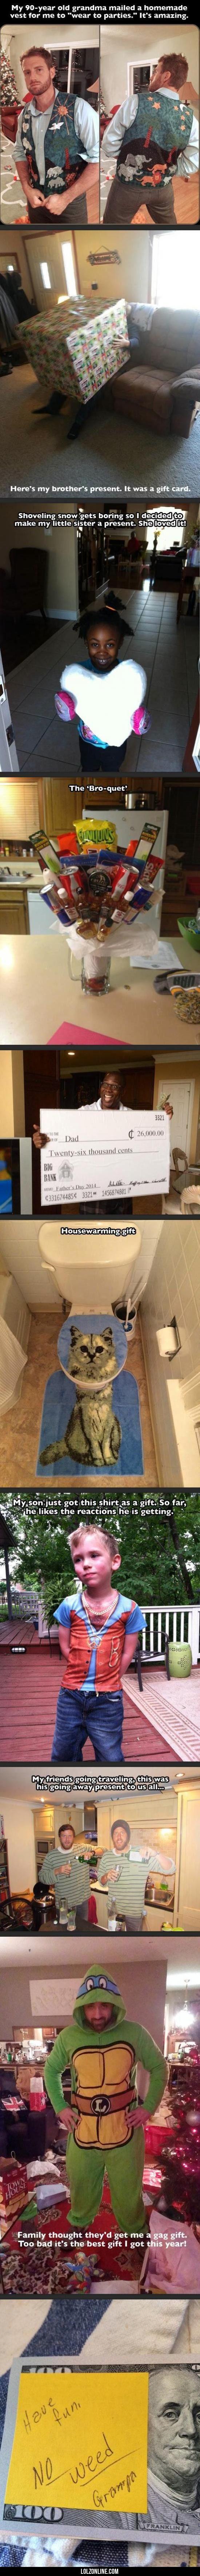 I knew you were here. I felt your presents. #lol #haha #funny